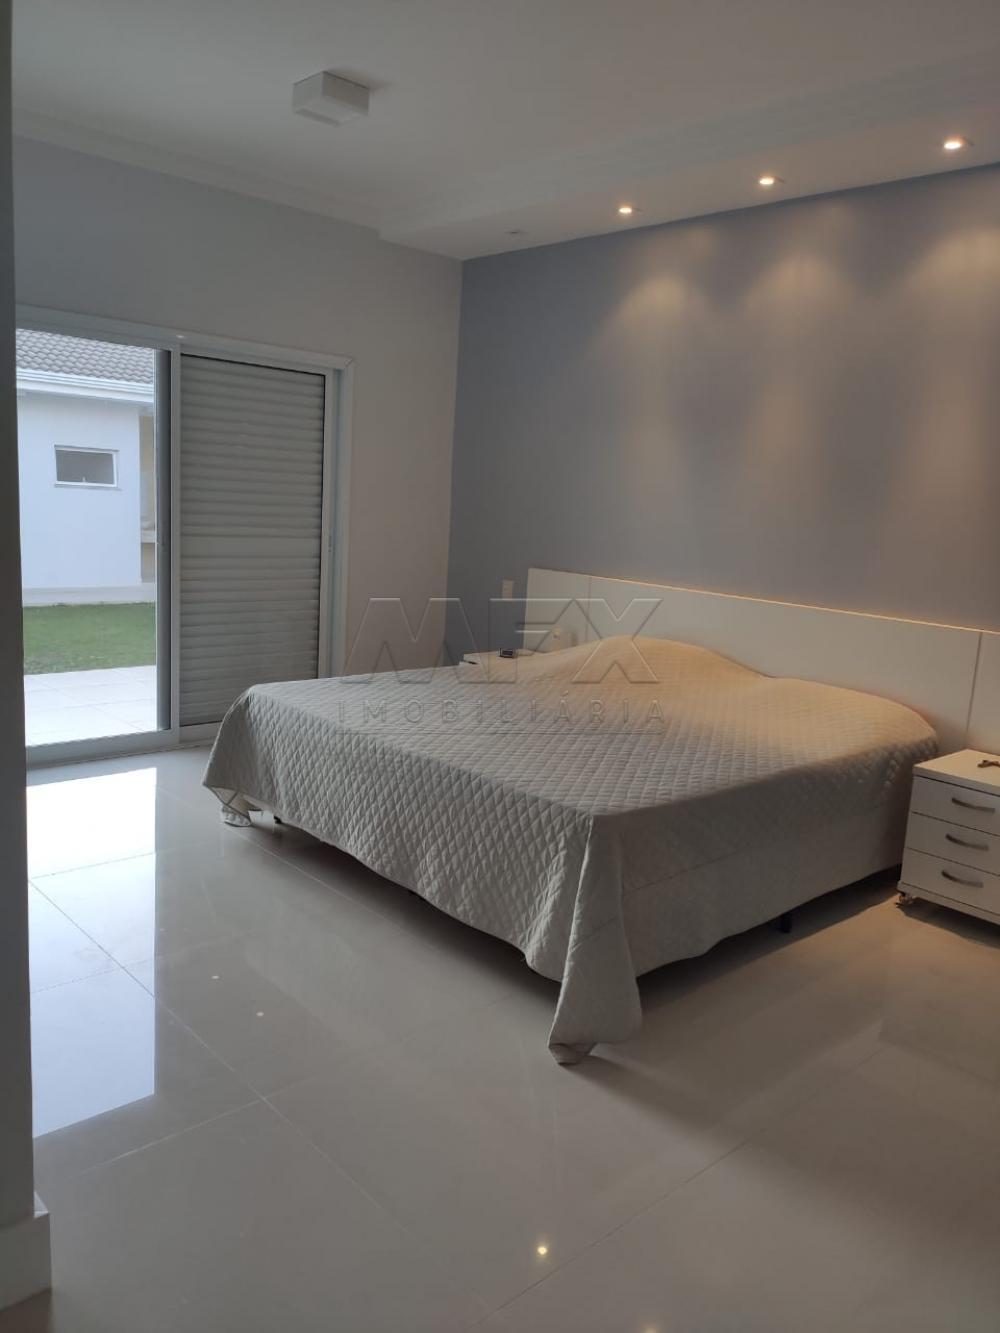 Comprar Casa / Condomínio em Bauru apenas R$ 1.800.000,00 - Foto 28